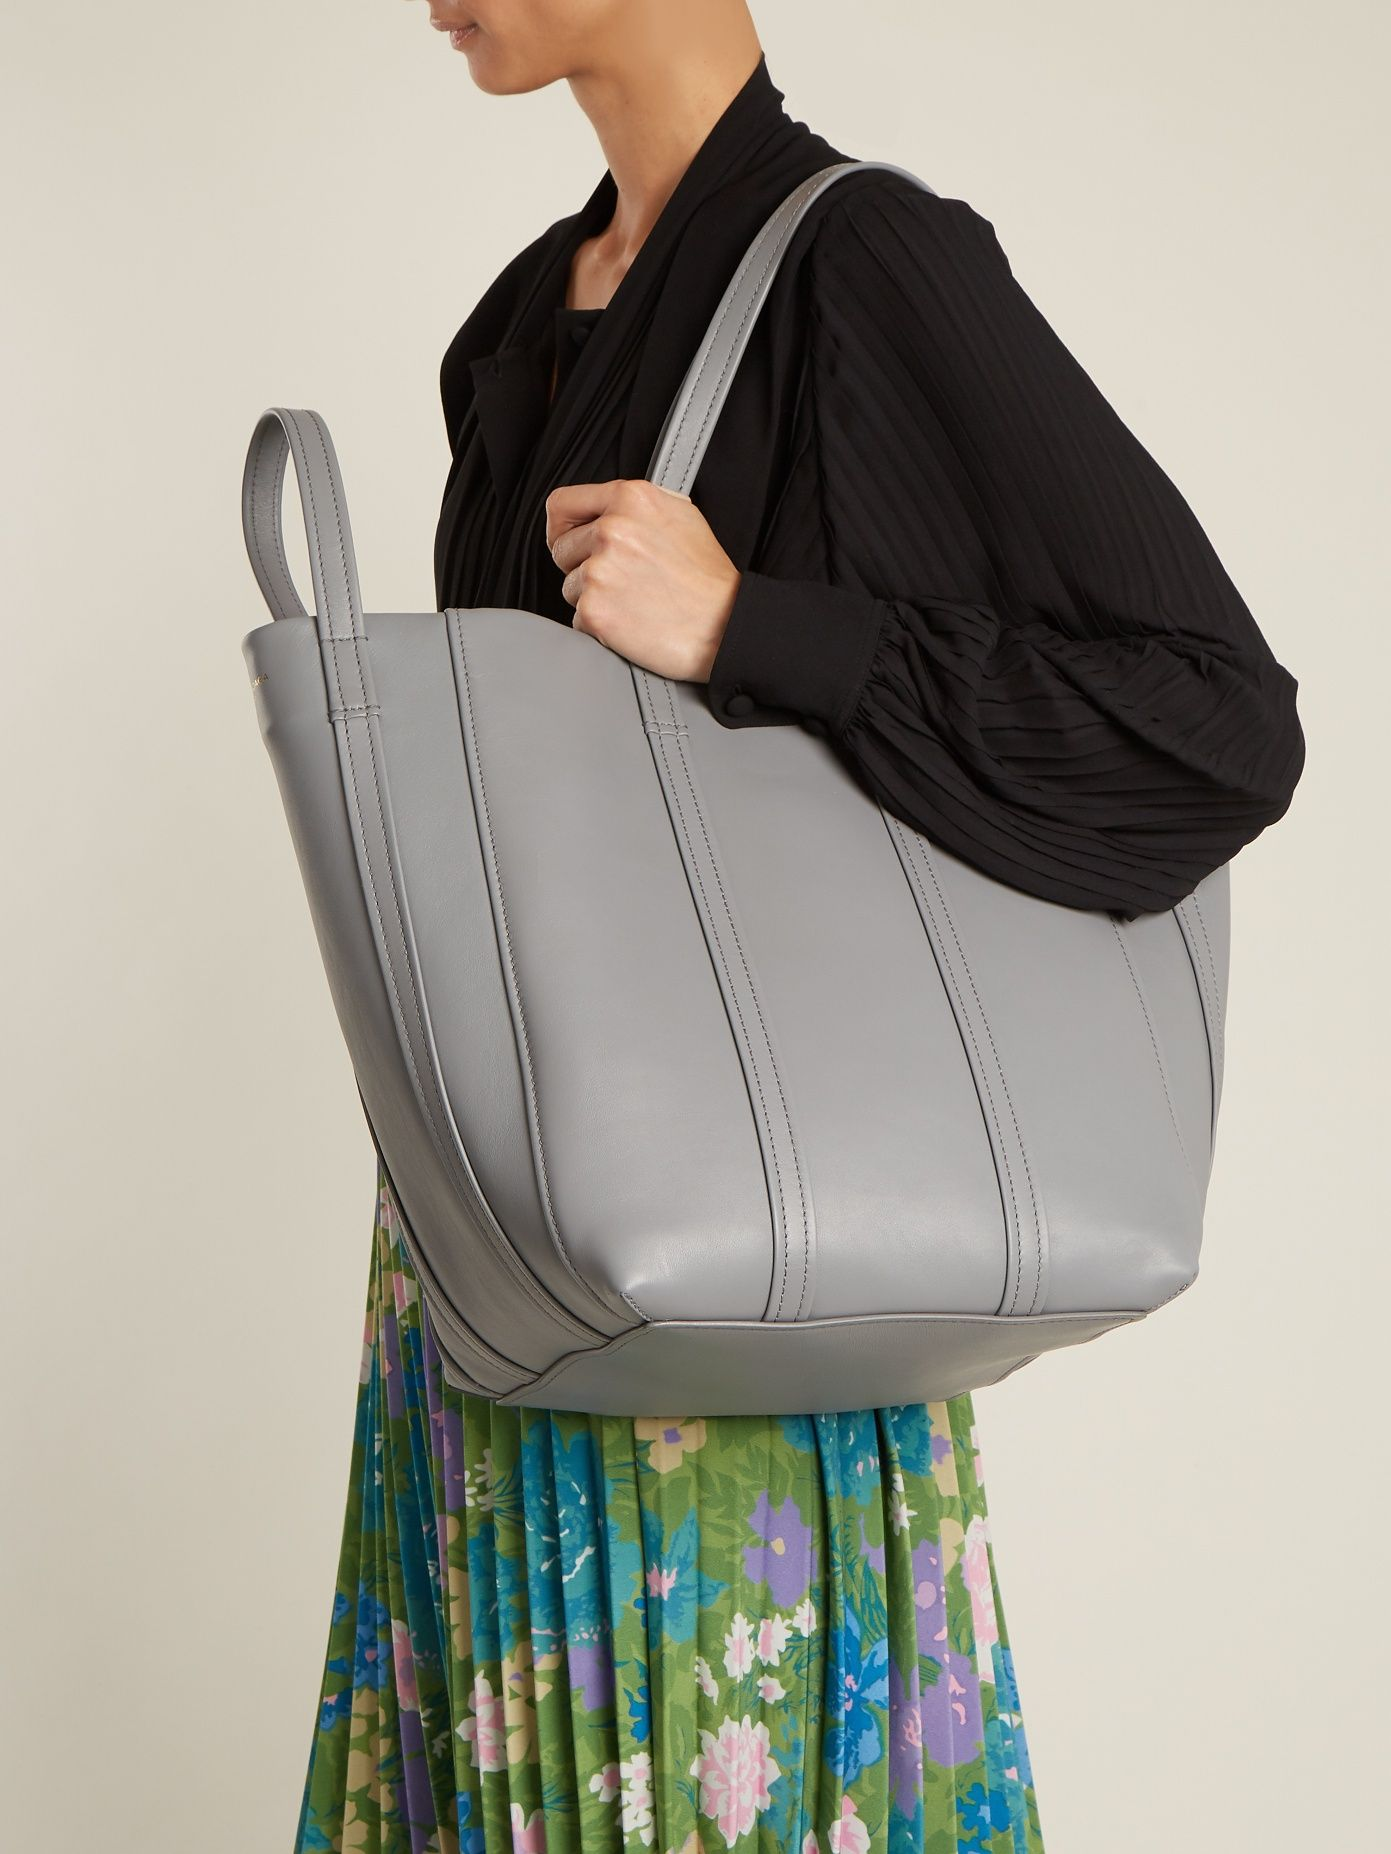 Click Here To Buy Balenciaga Laundry Cabas S Tote At Matchesfashion Com Carteras Balenciaga Shopper Tote Bags